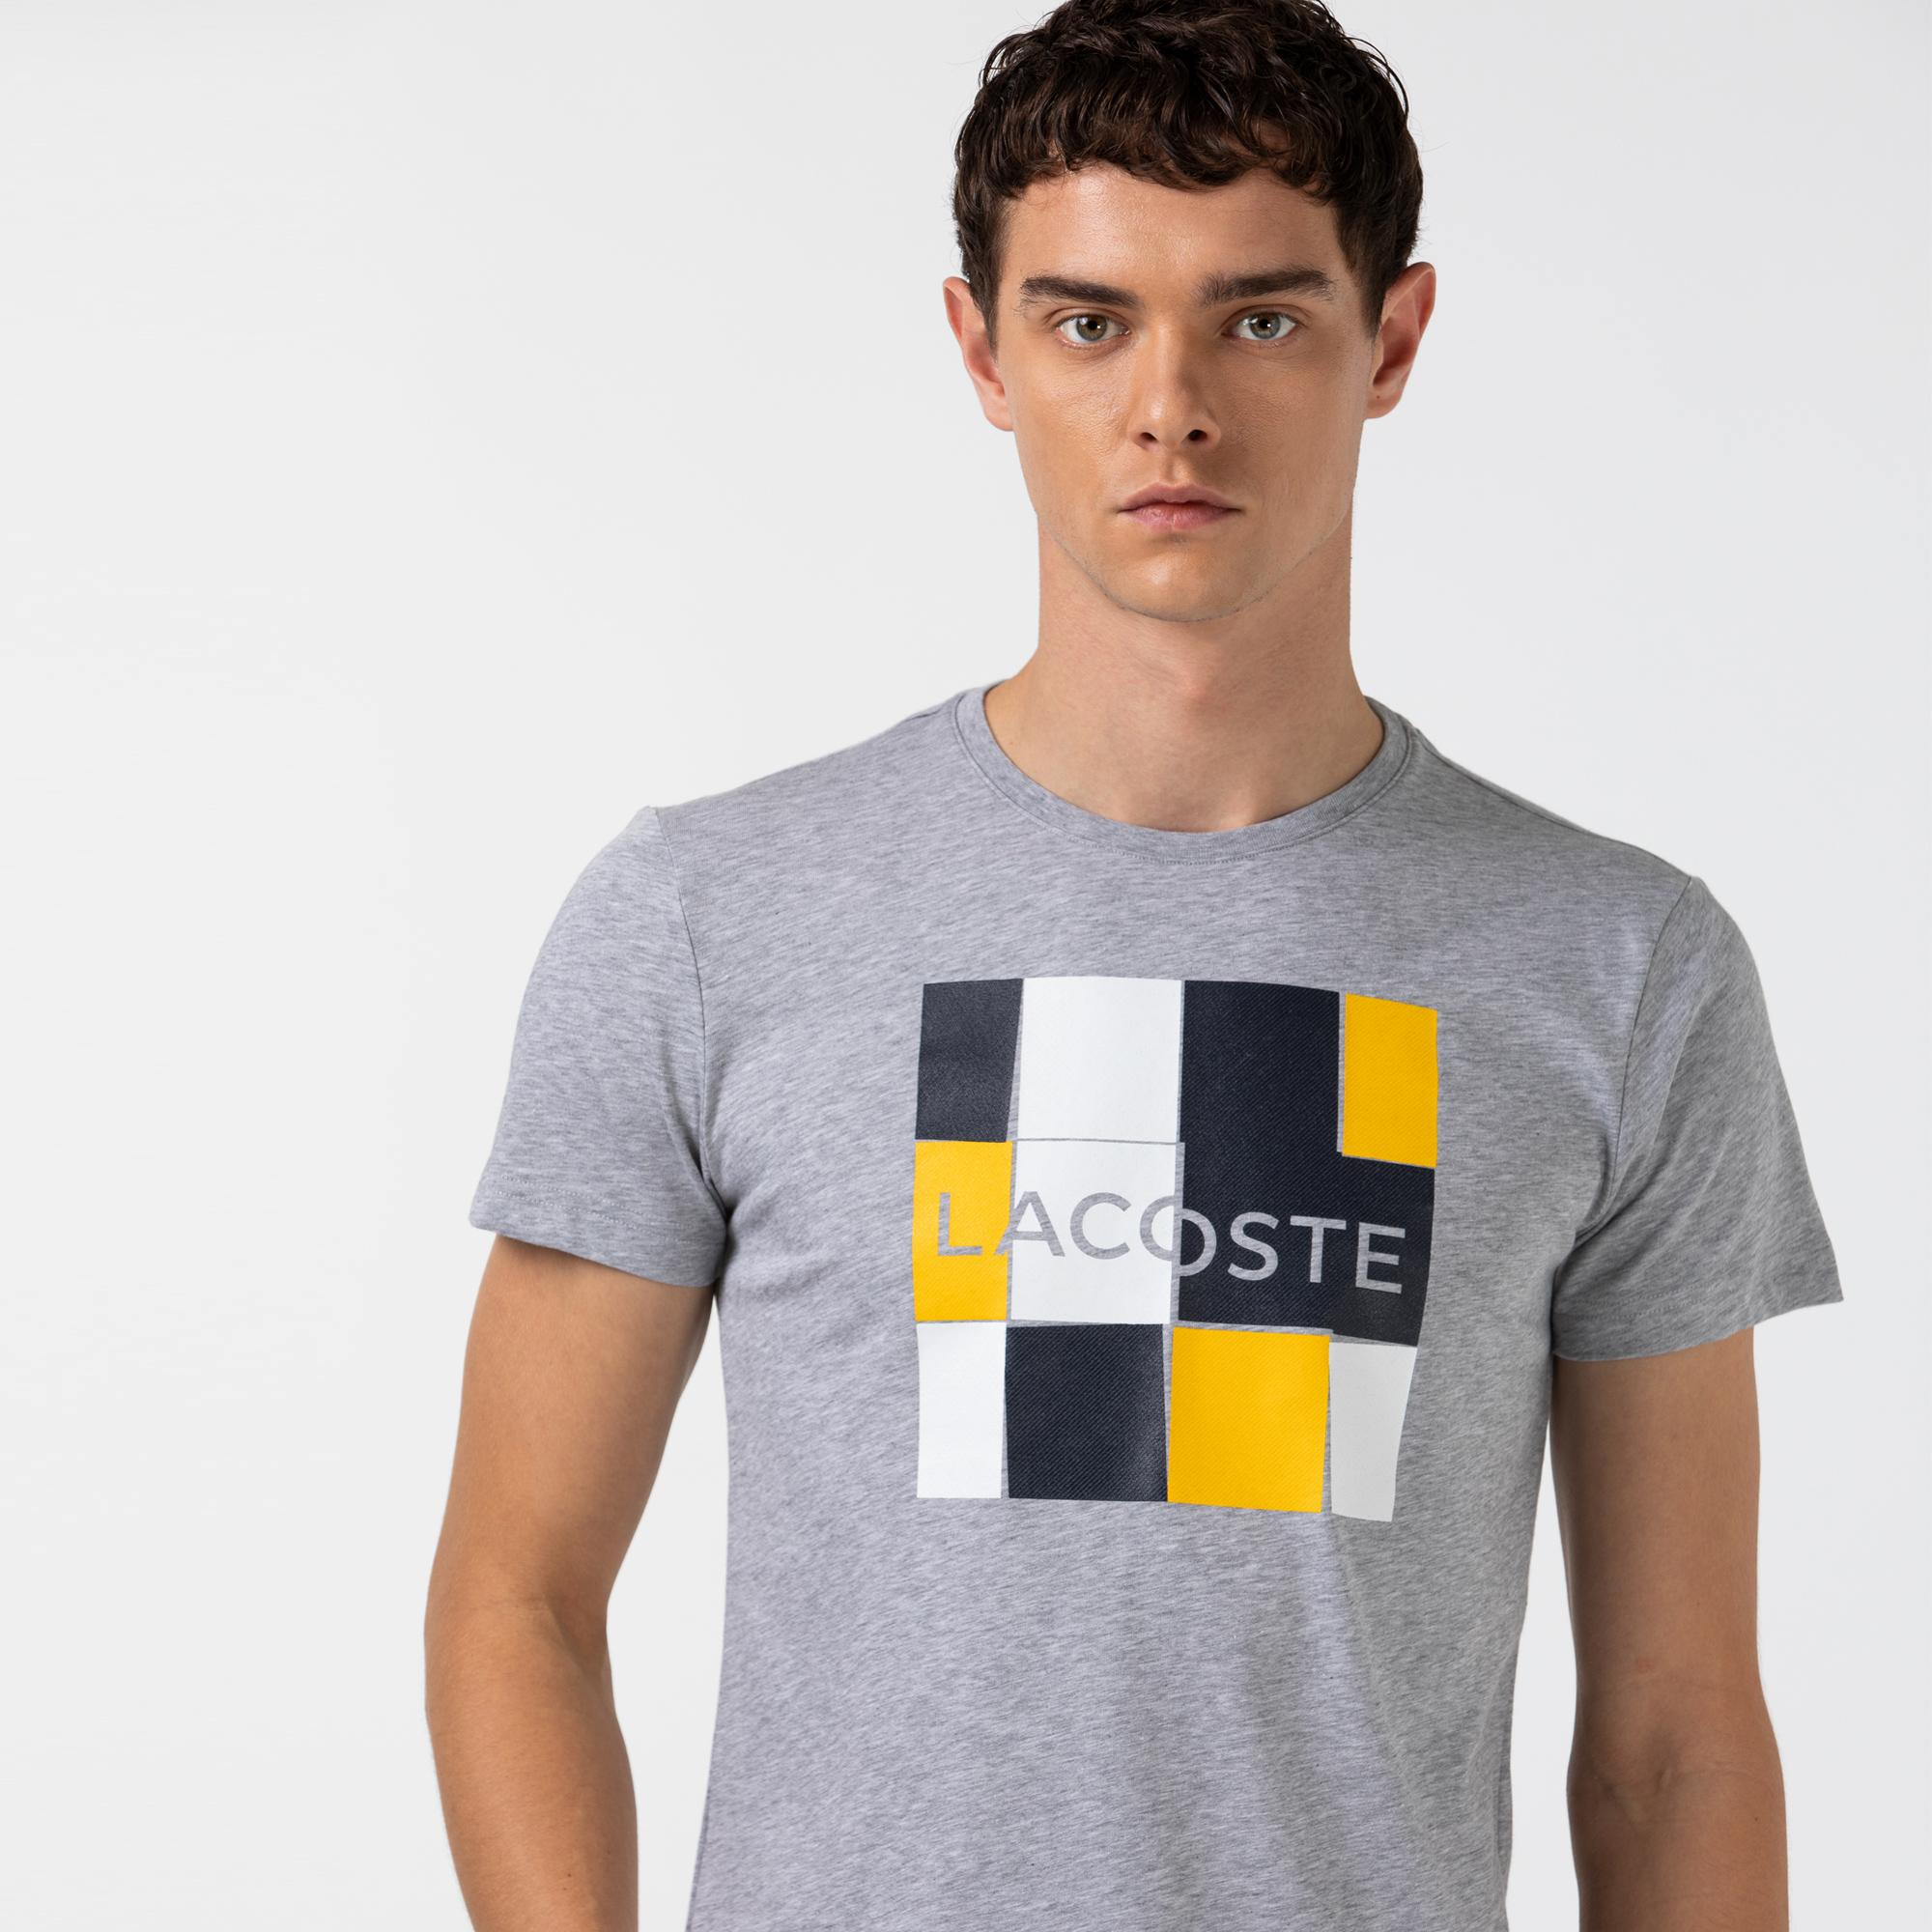 Lacoste Sport Erkek Baskılı Bisiklet Yaka Gri T-Shirt